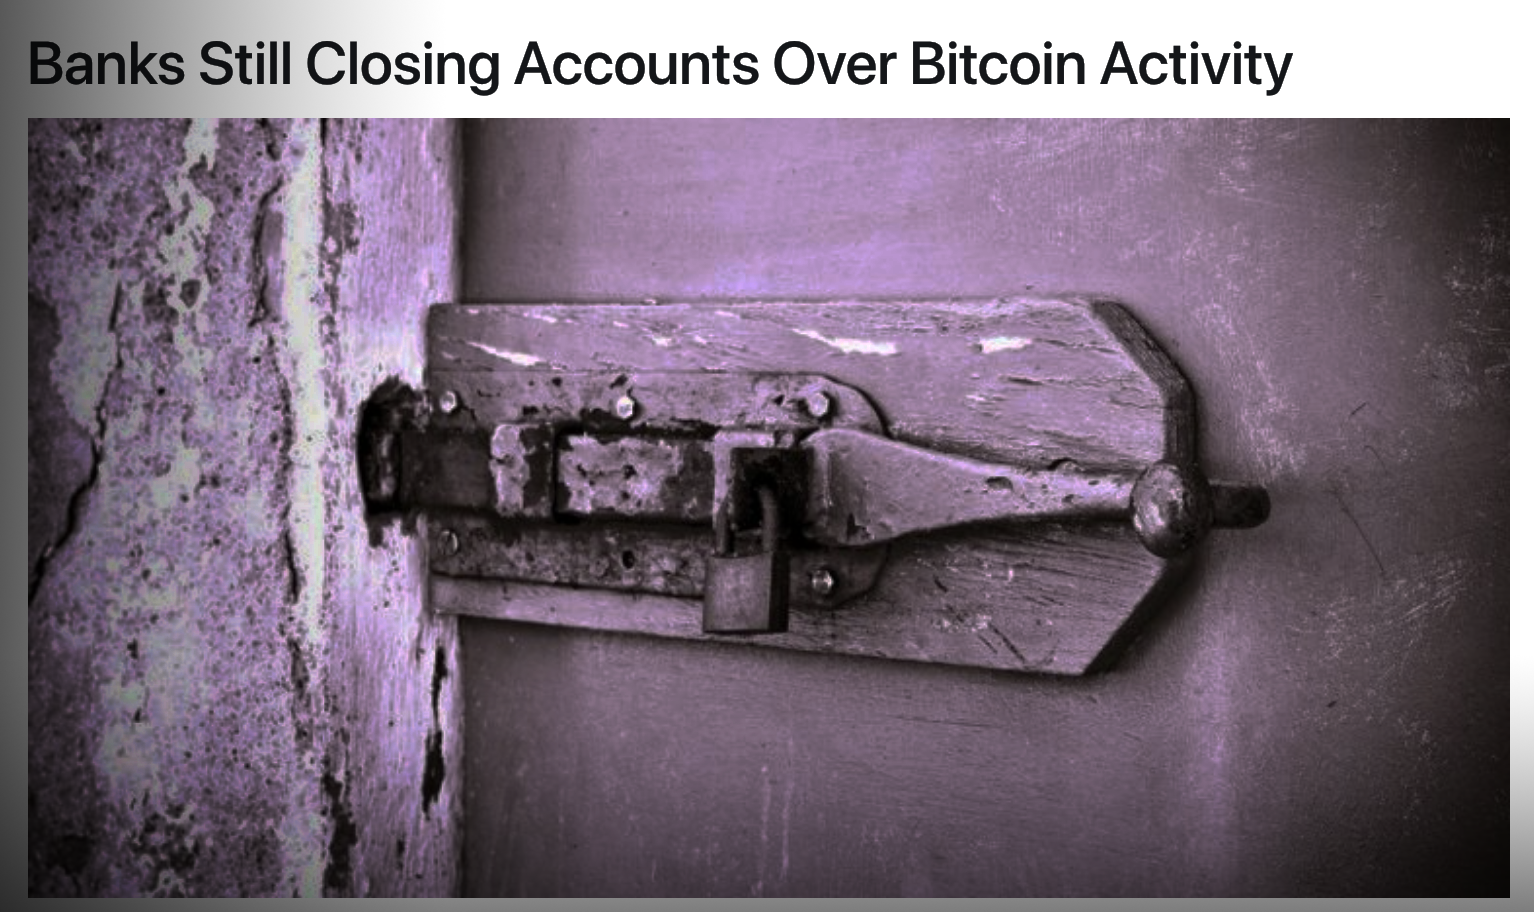 https://www.ccn.com/banks-still-closing-accounts-bitcoin-activity/